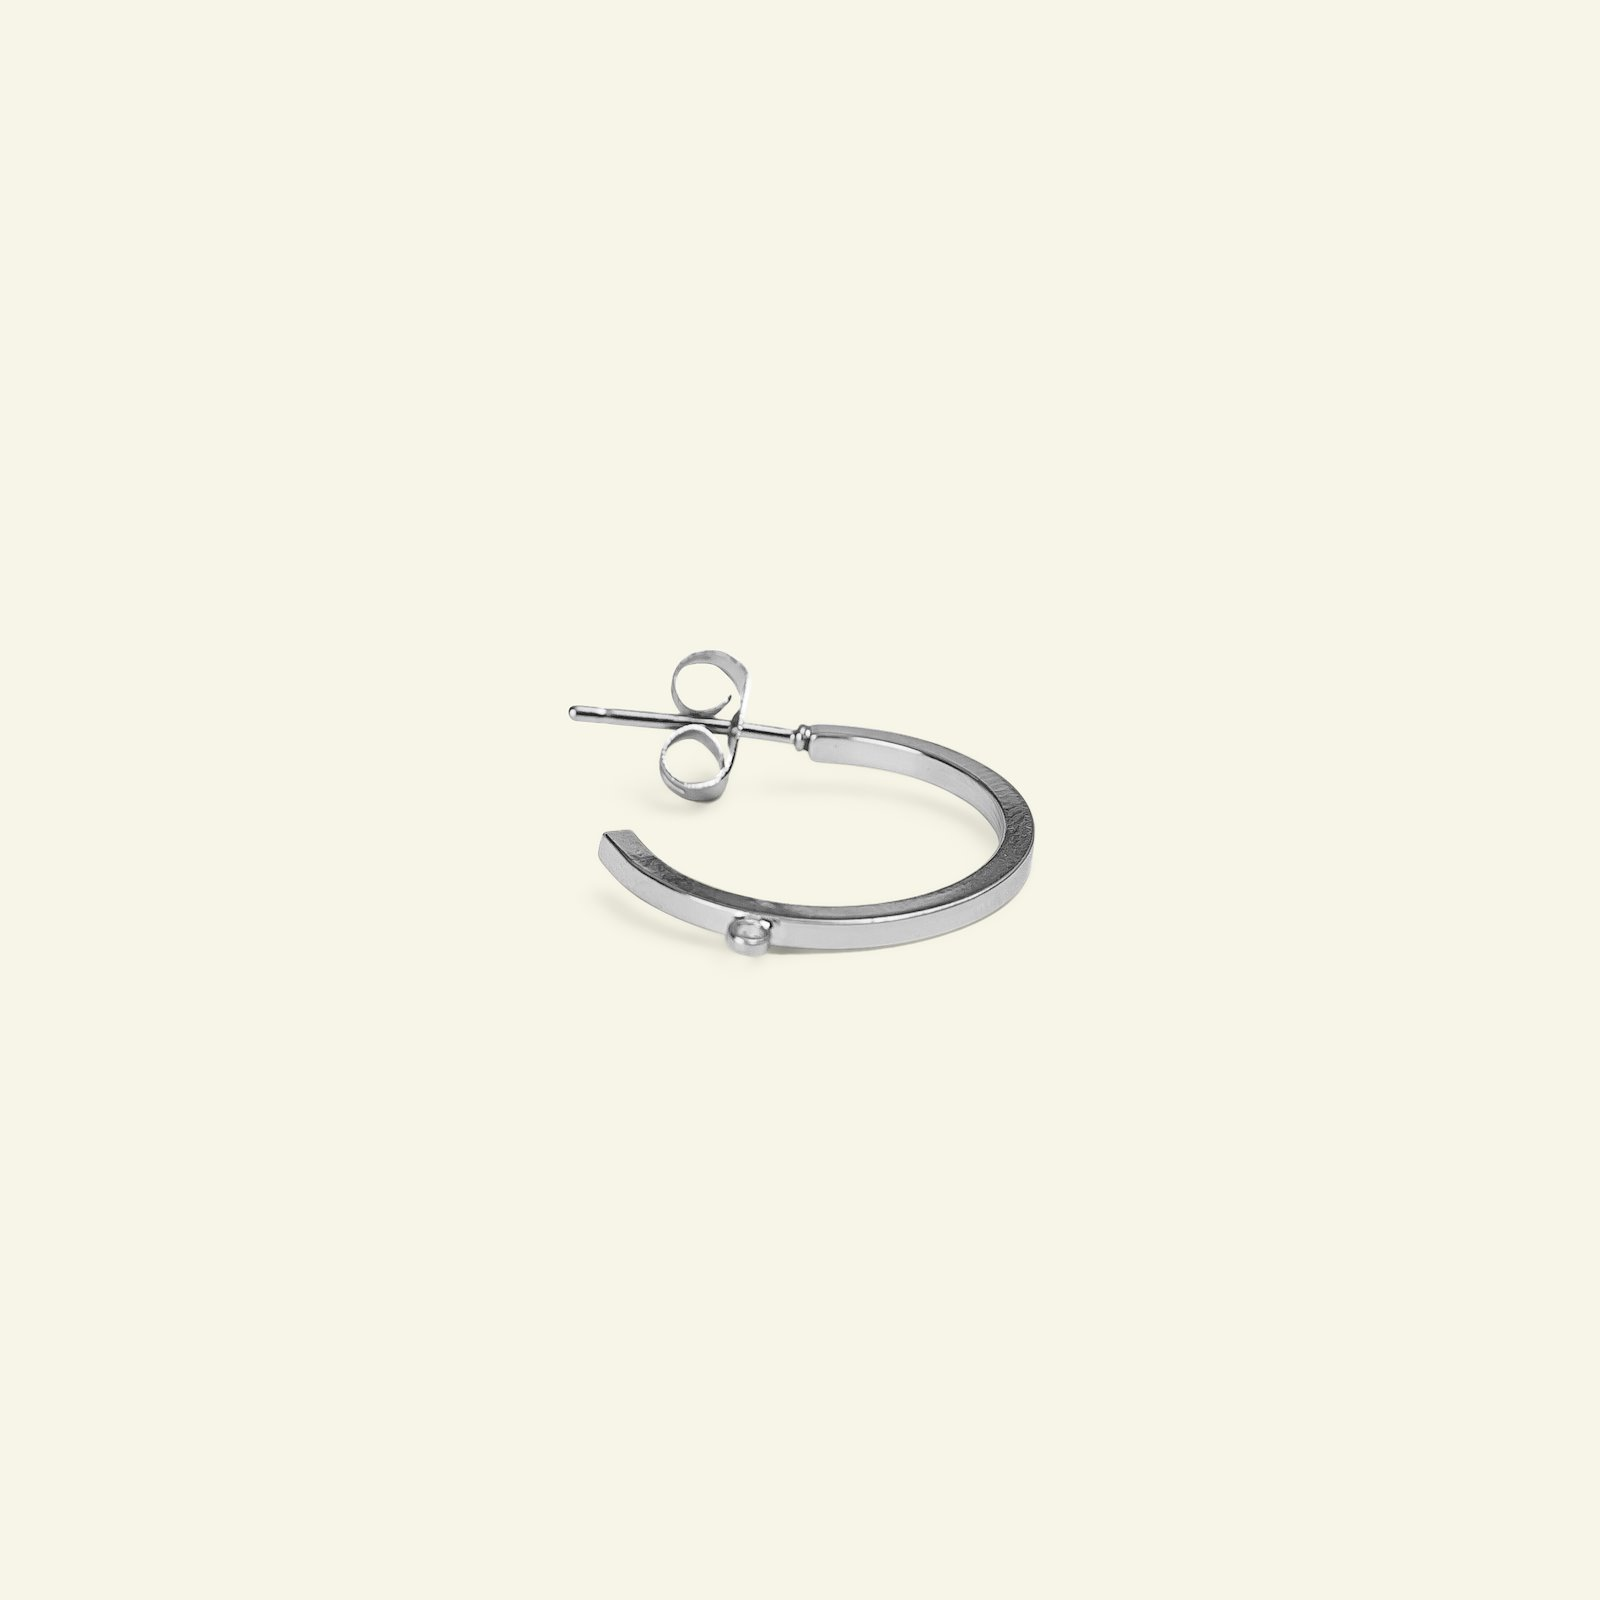 Ear ring hoops 21mm silver 6pcs 45381_pack_b